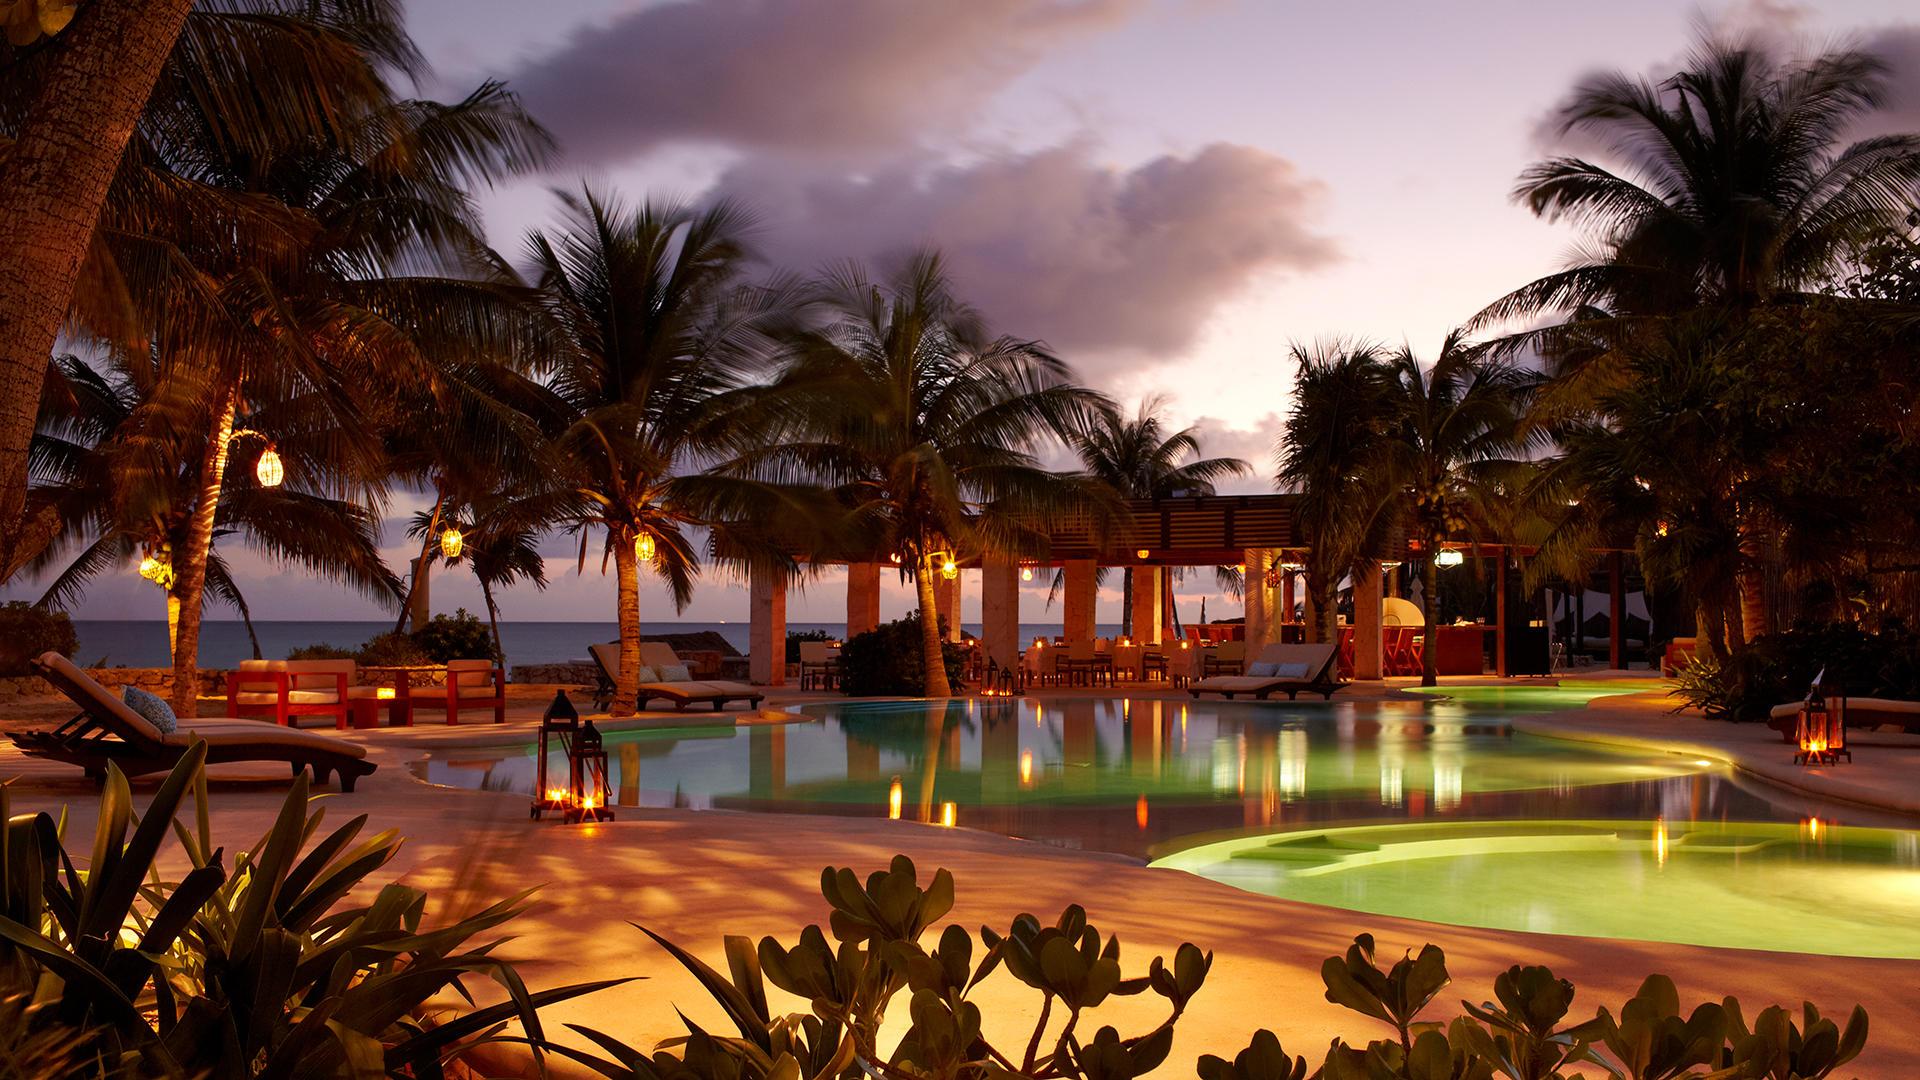 viceroy-riviera-maya-pool-twilight